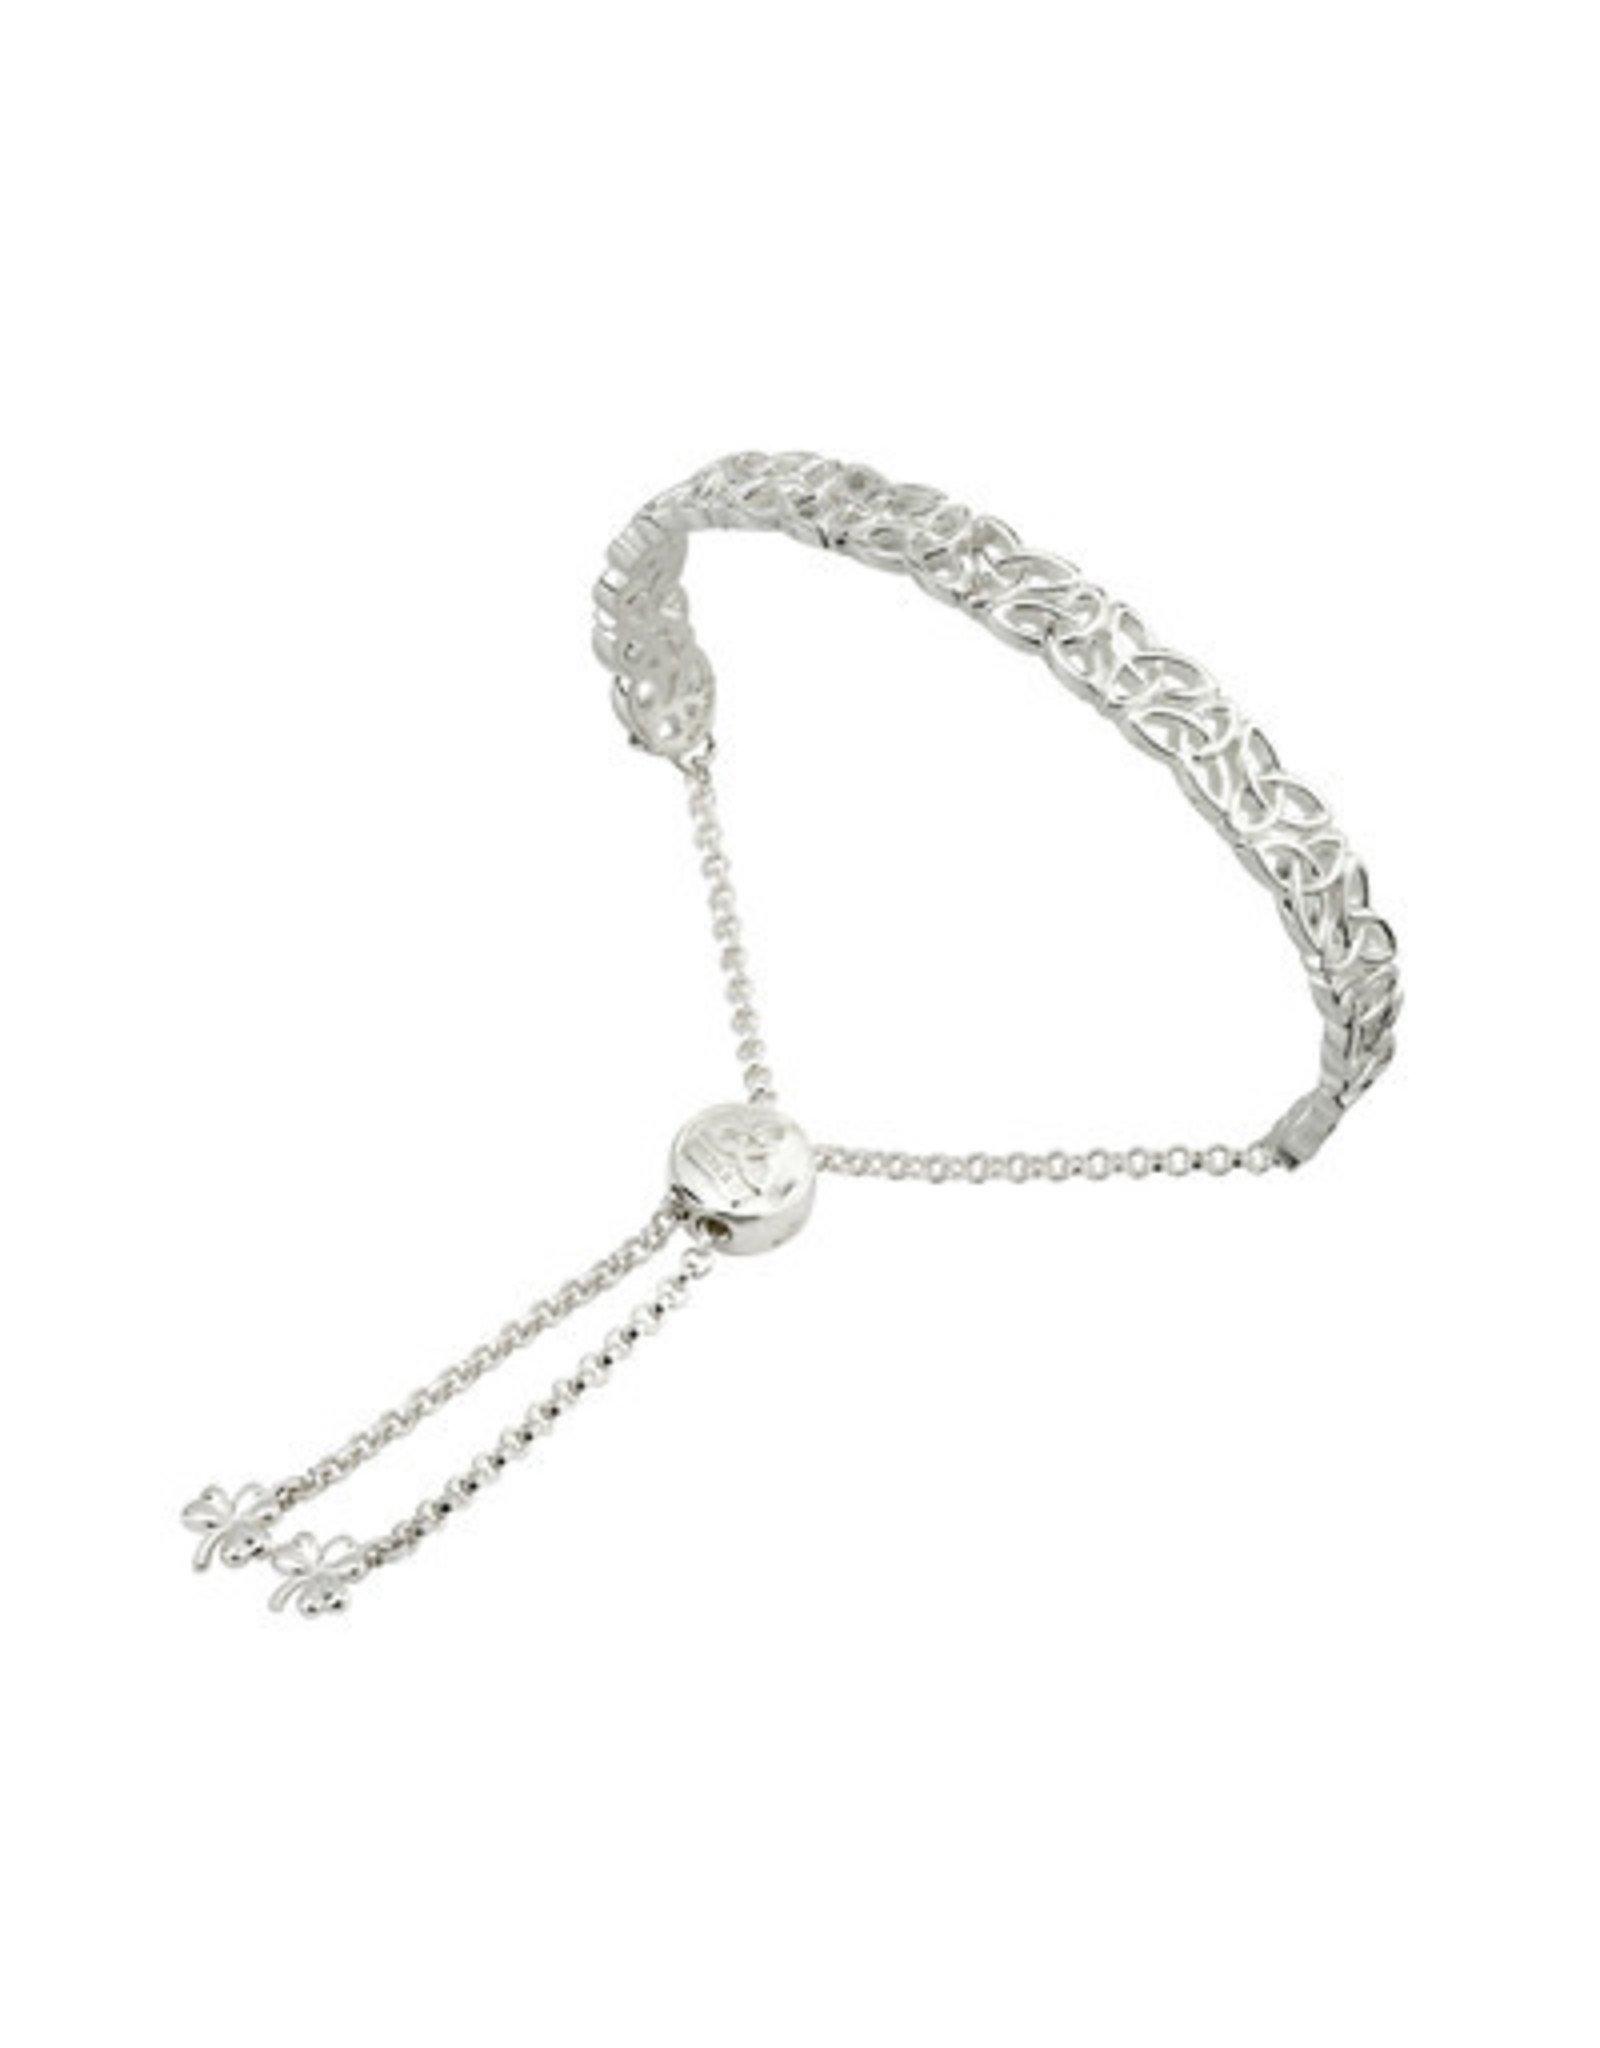 Solvar Sterling Silver Draw String Trinity Knot bangle